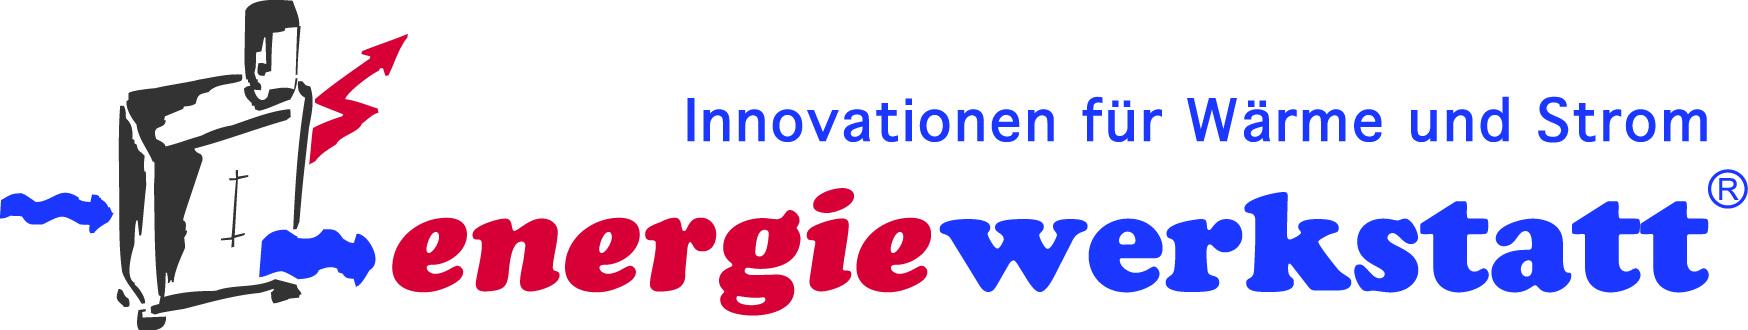 Energiewerkstatt GmbH &  Co. KG